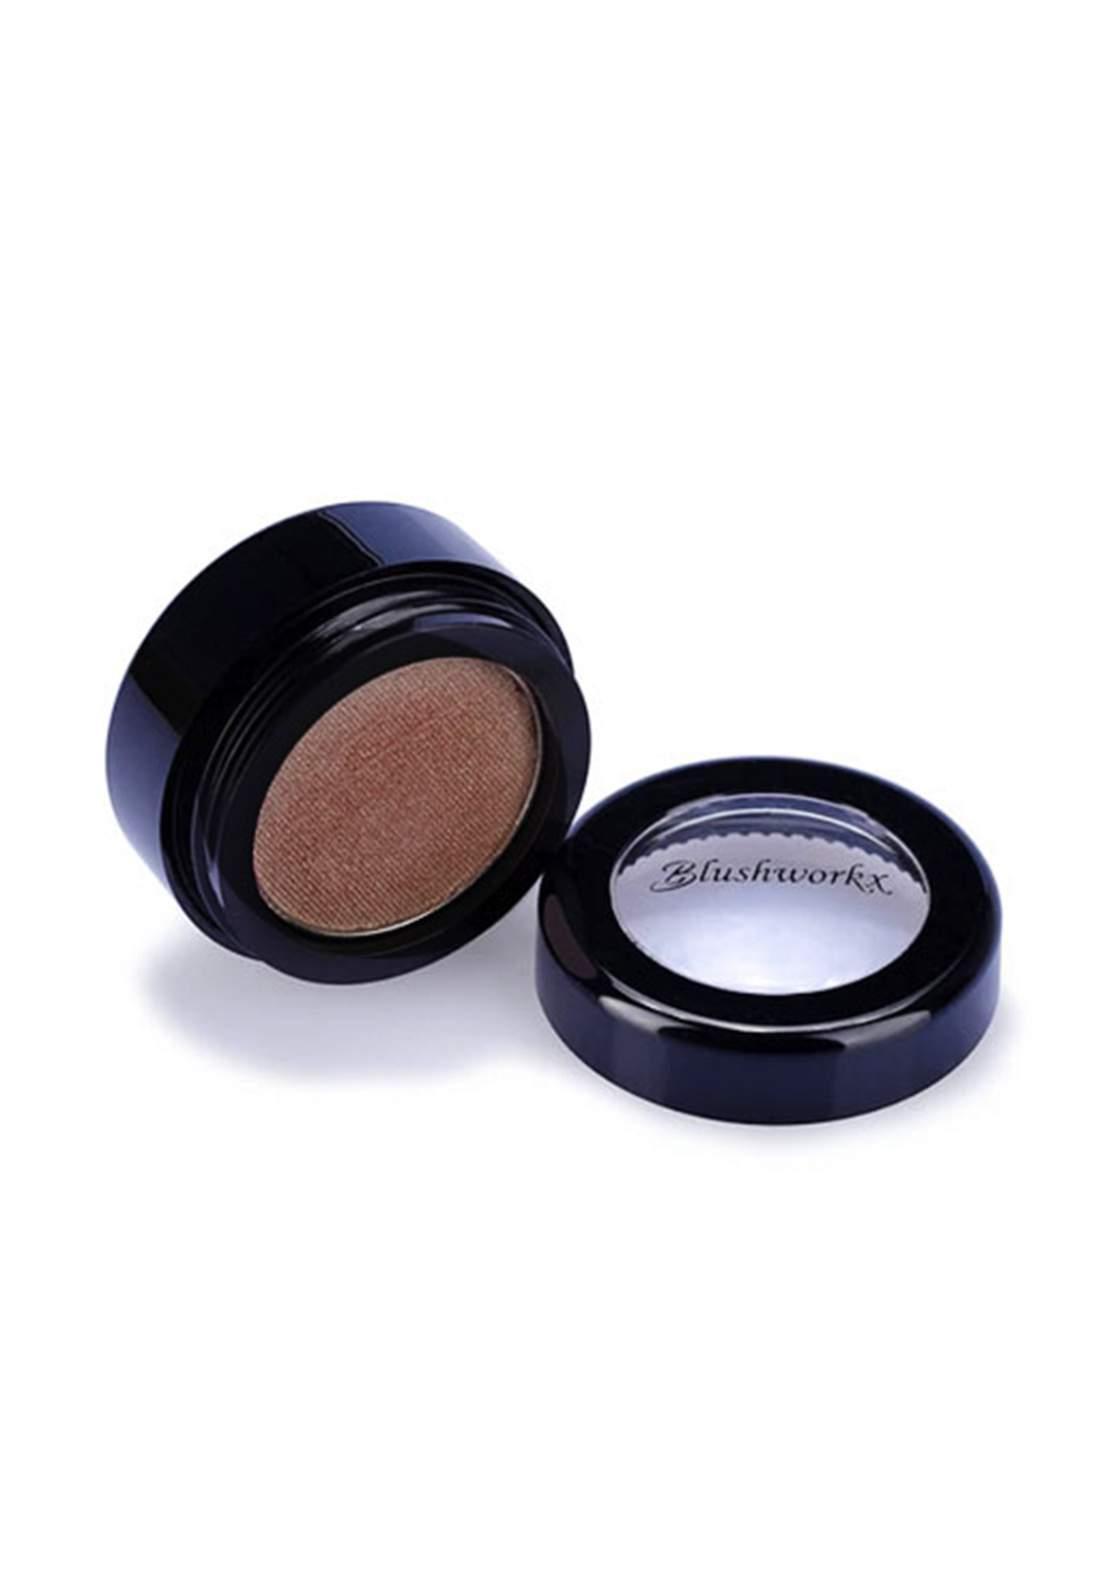 Blushworkx Hollywood Mineral Eye Color No.B9 Tan 1.8g ظلال للعيون